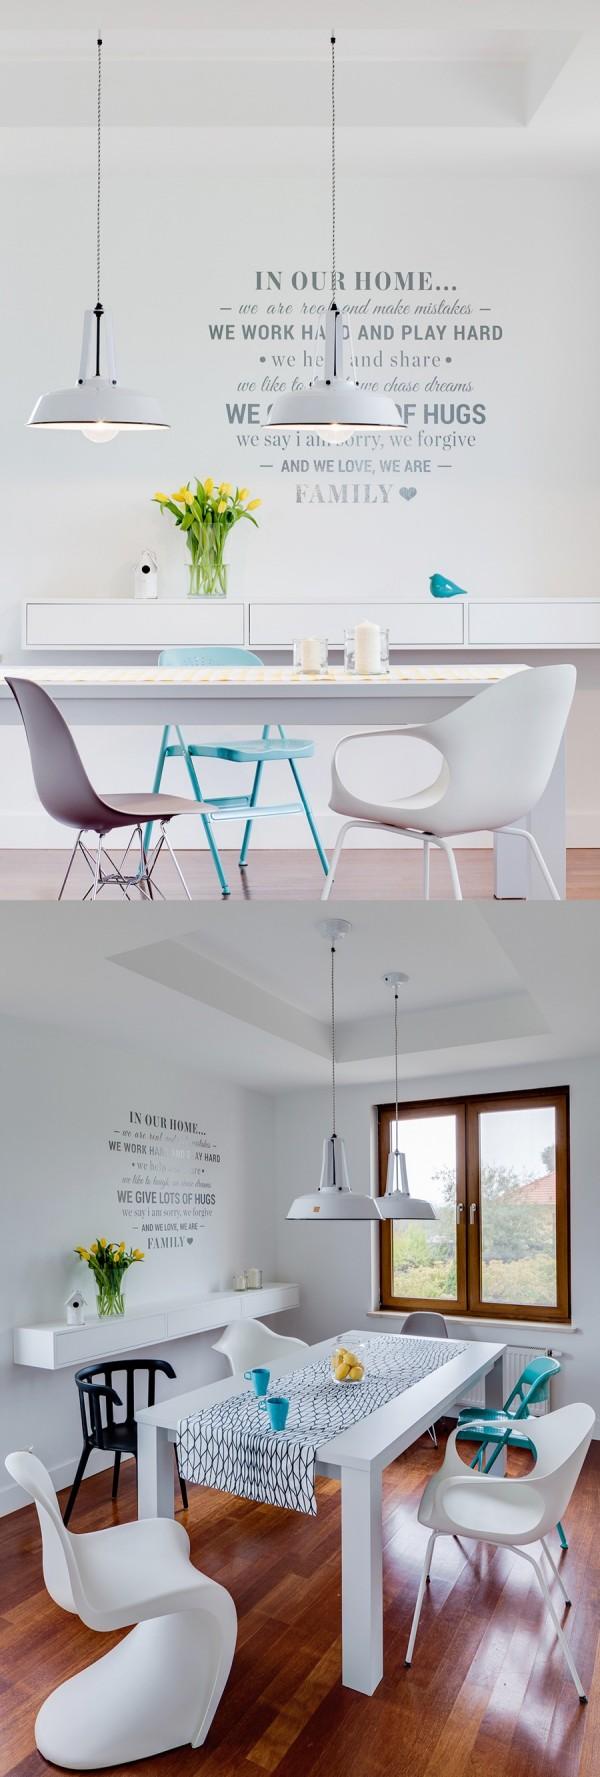 dizain-stolovoi-v-sovremennom-stile-14